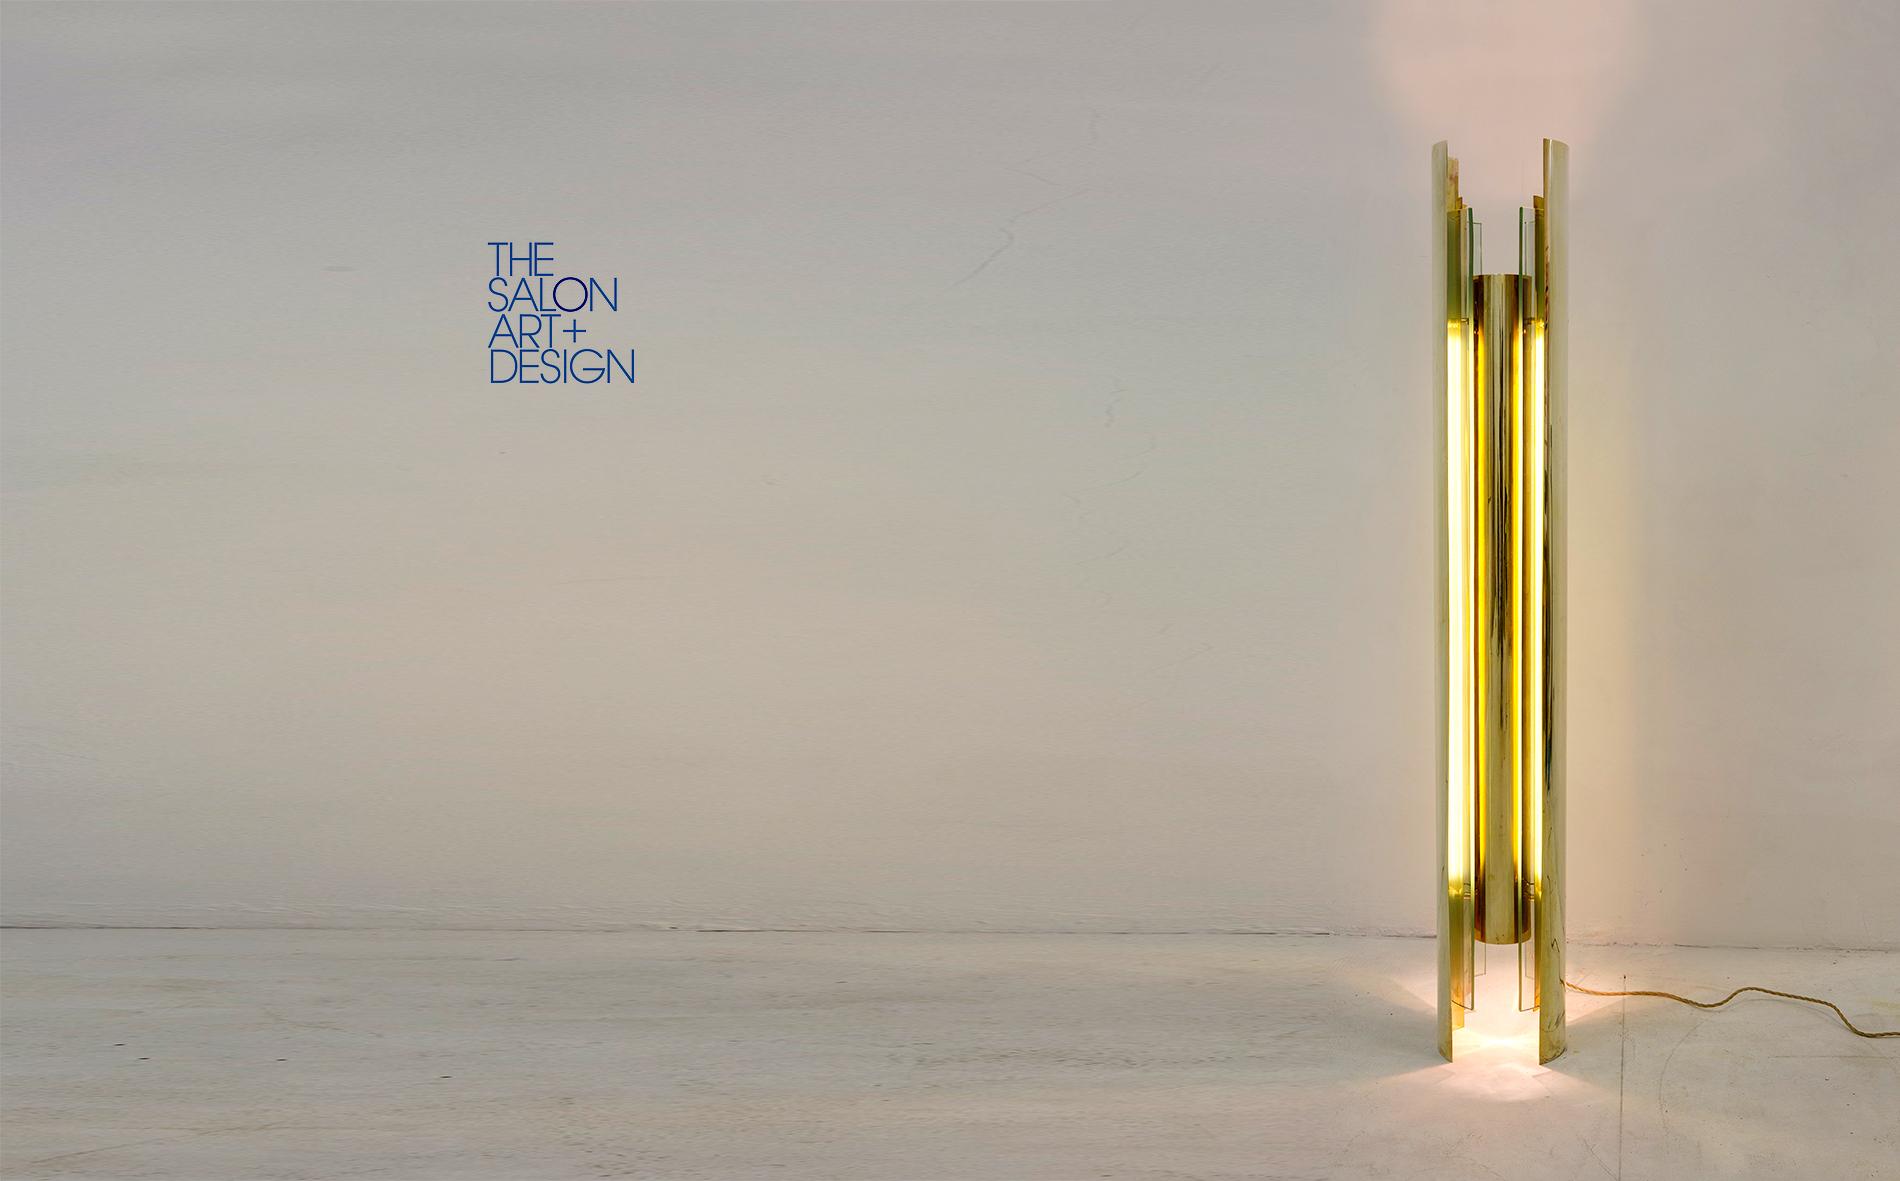 Marco Bevilacqua for Gate 5 Gallery – Tacito Floor Lamp in The Salone Art + Design, New York 2016